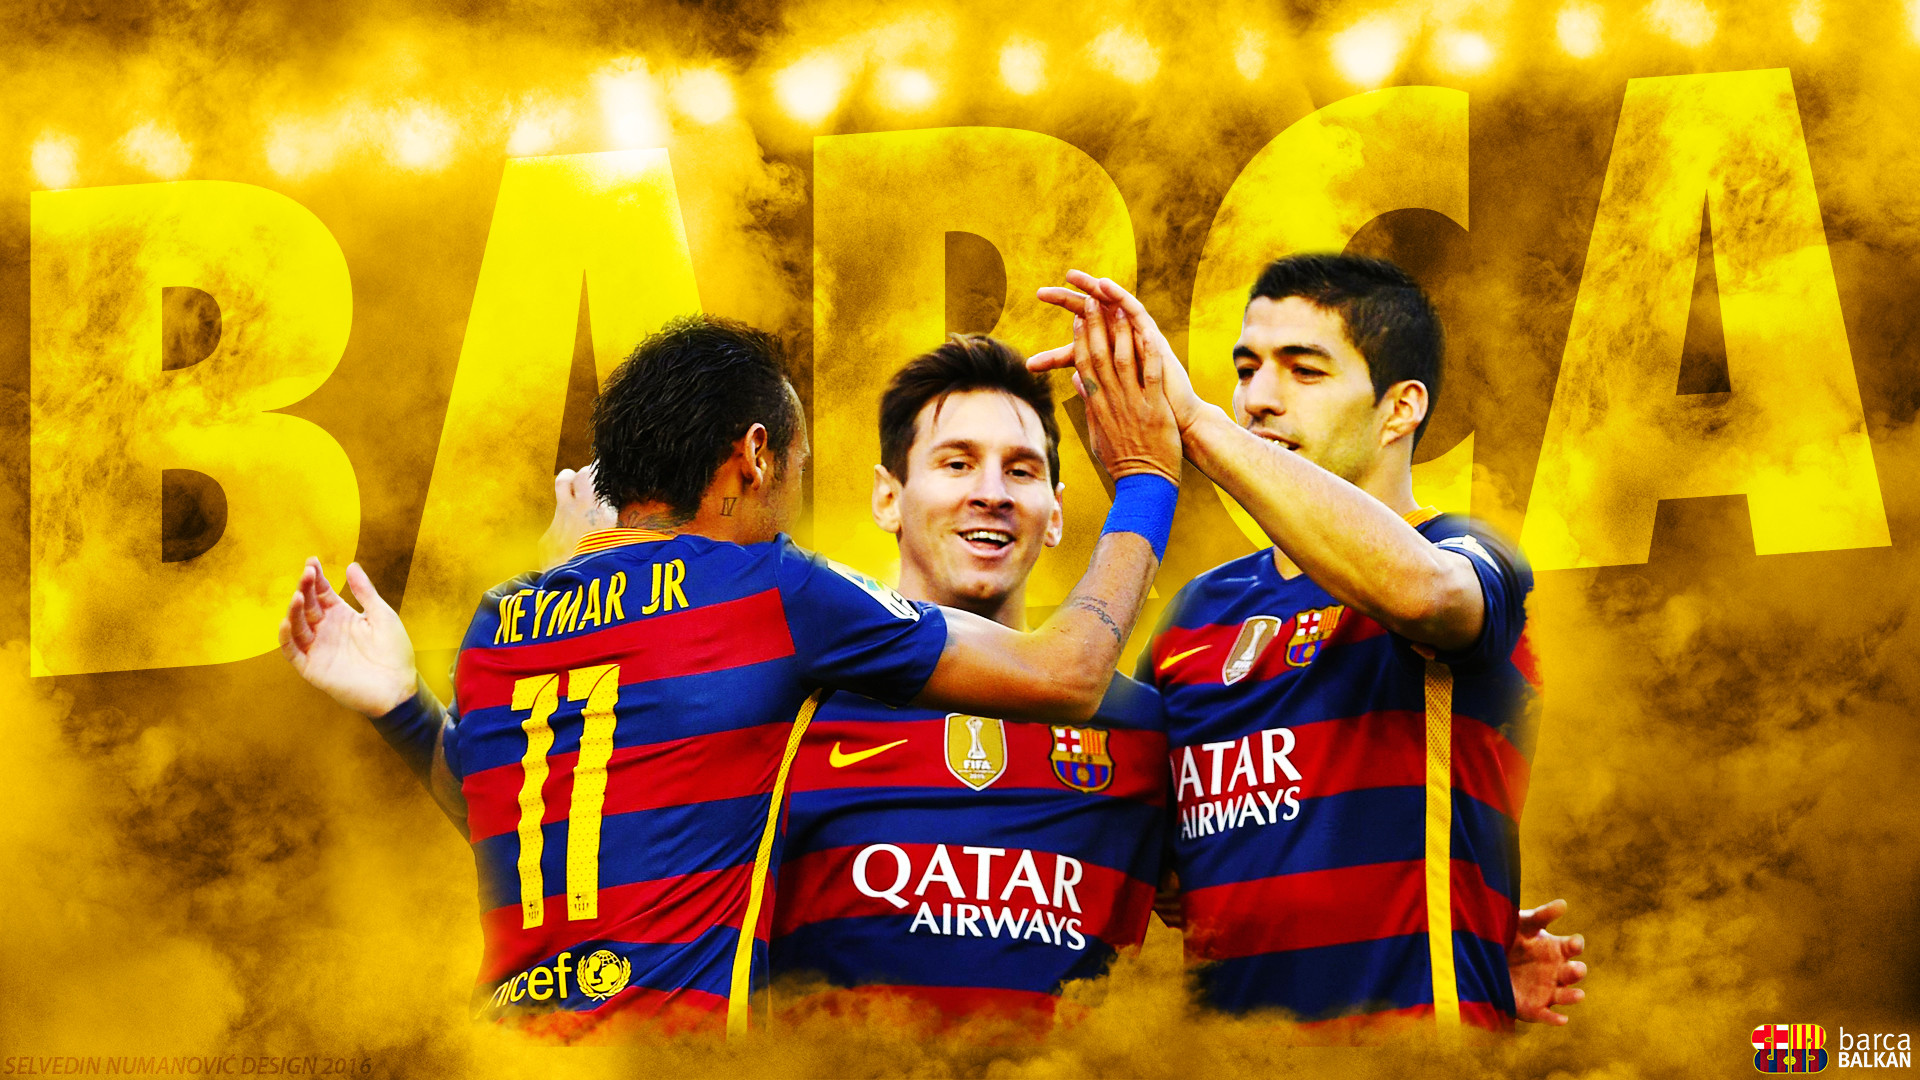 … Messi Suarez Neymar 2016 – HD WALLPAPER by SelvedinFCB